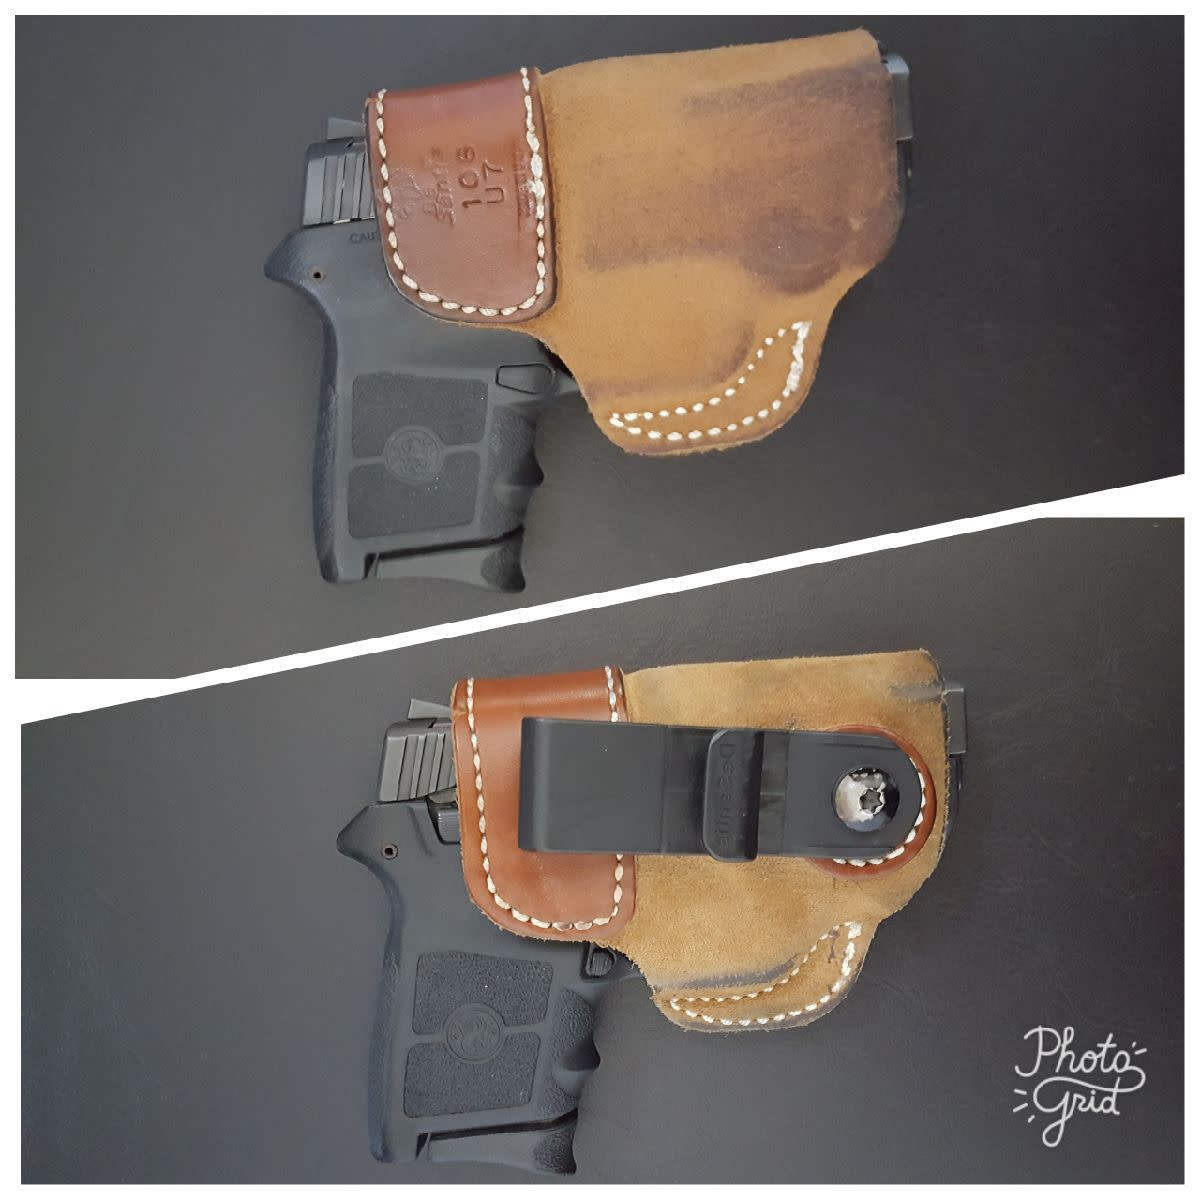 DeSantis Gunhide Sof-Tuck: Perfect IWB Carry for Your Favorite Pocket Pistol